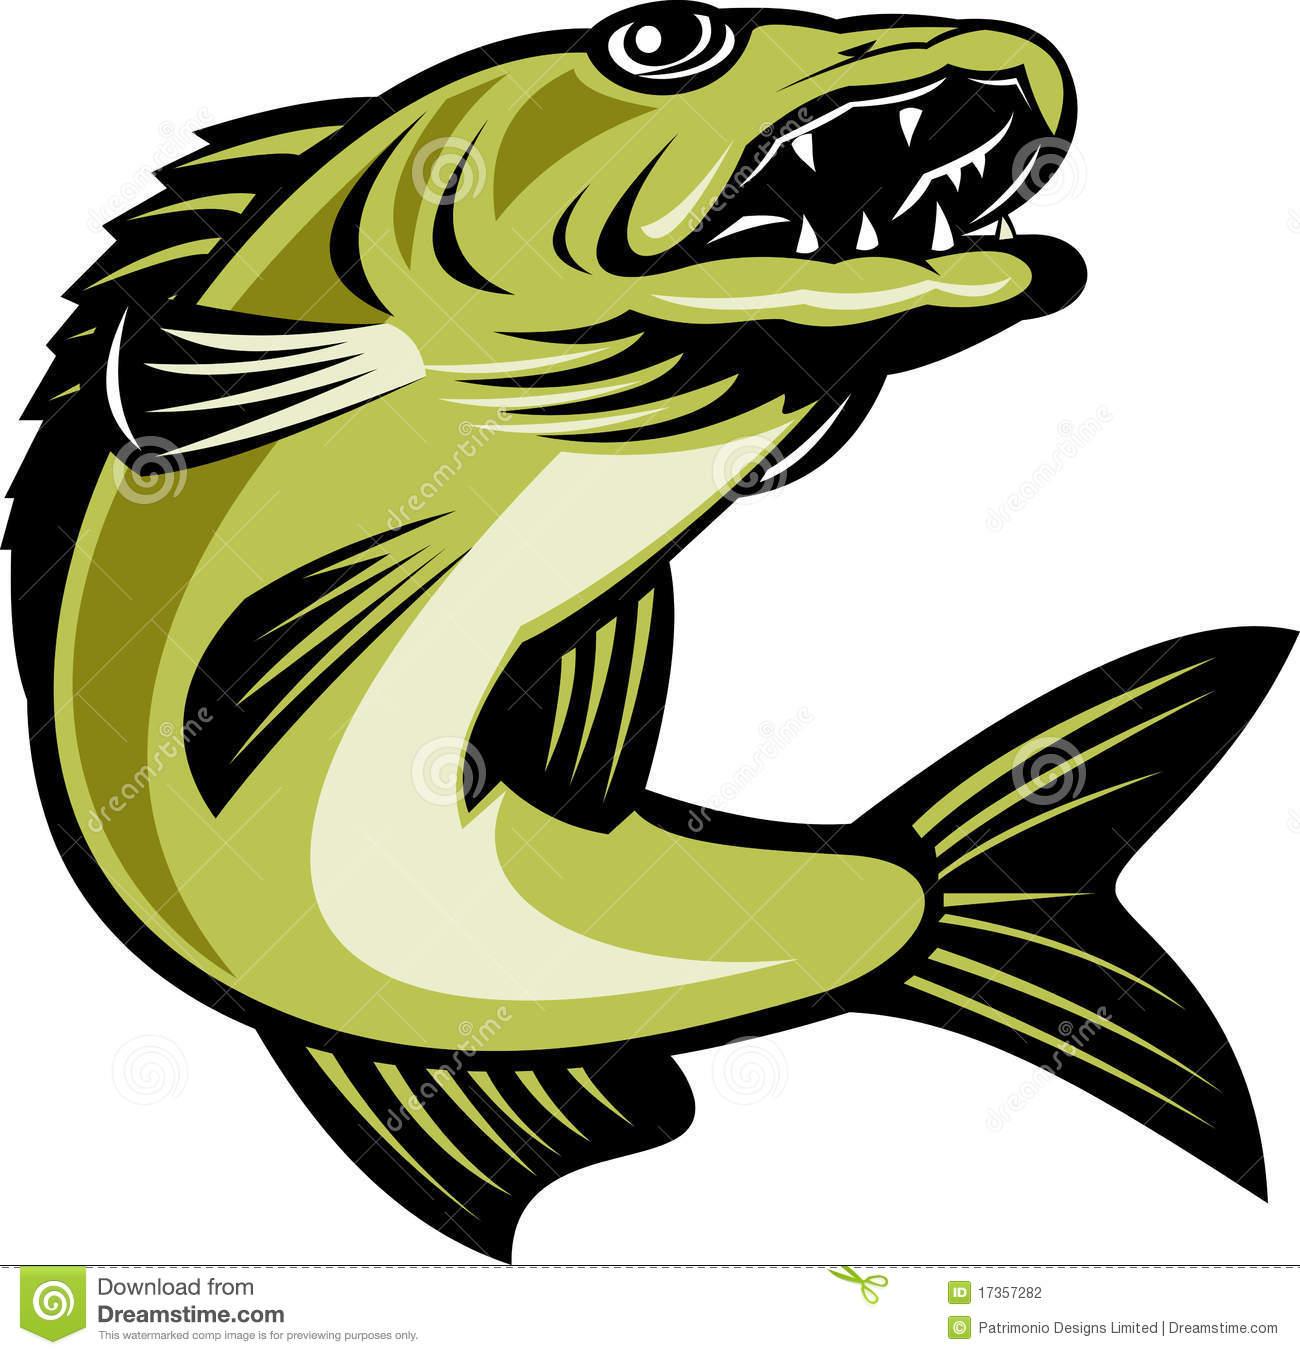 Jumping Fish Clipart - Clipart Kid